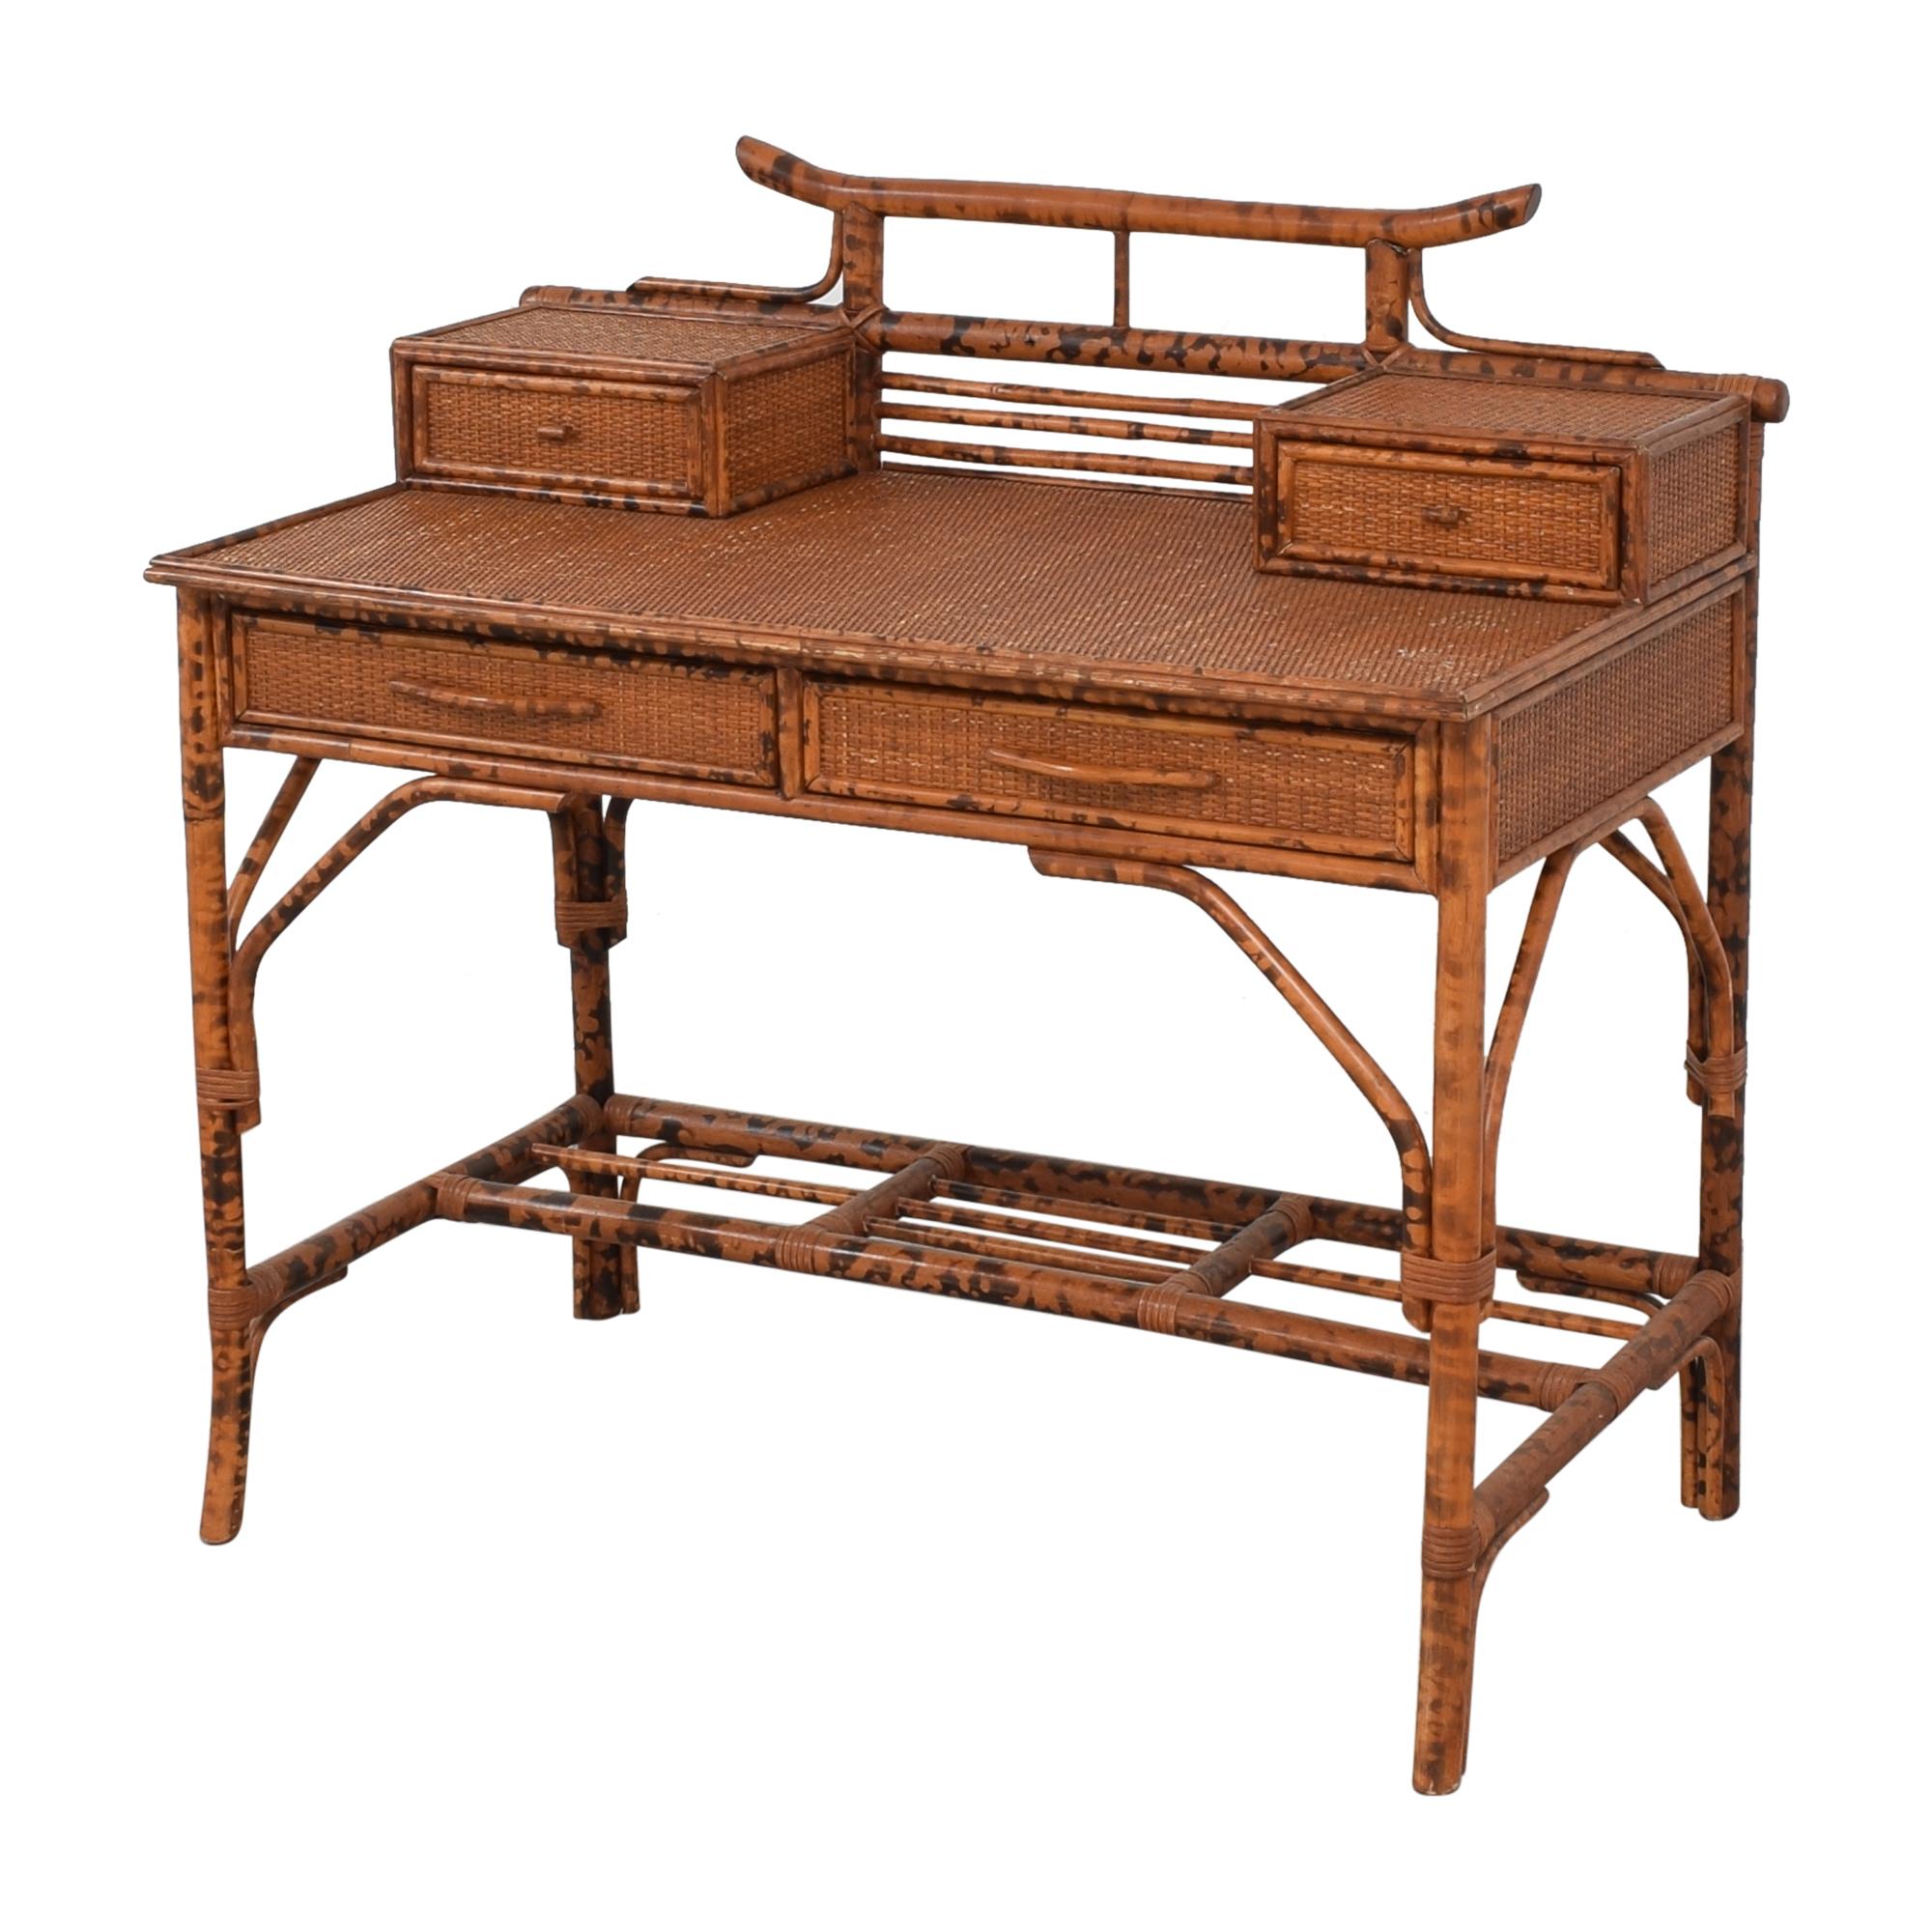 Bloomingdale's Bloomingdale's Chinoiserie Style Writing Desk on sale